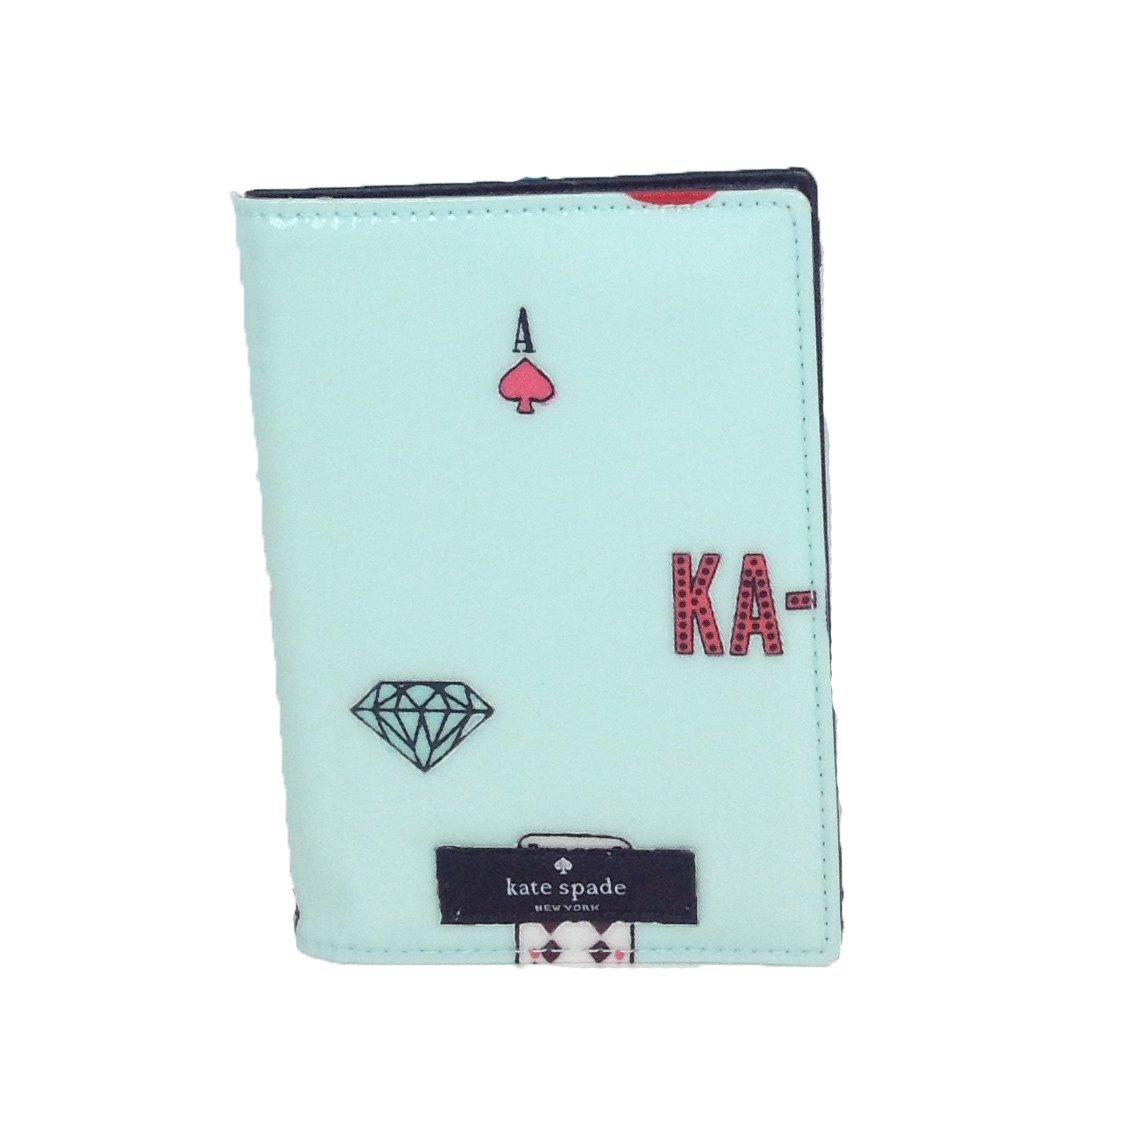 Kate Spade Las Vegas Icon Daycation Passport Holder, Multi